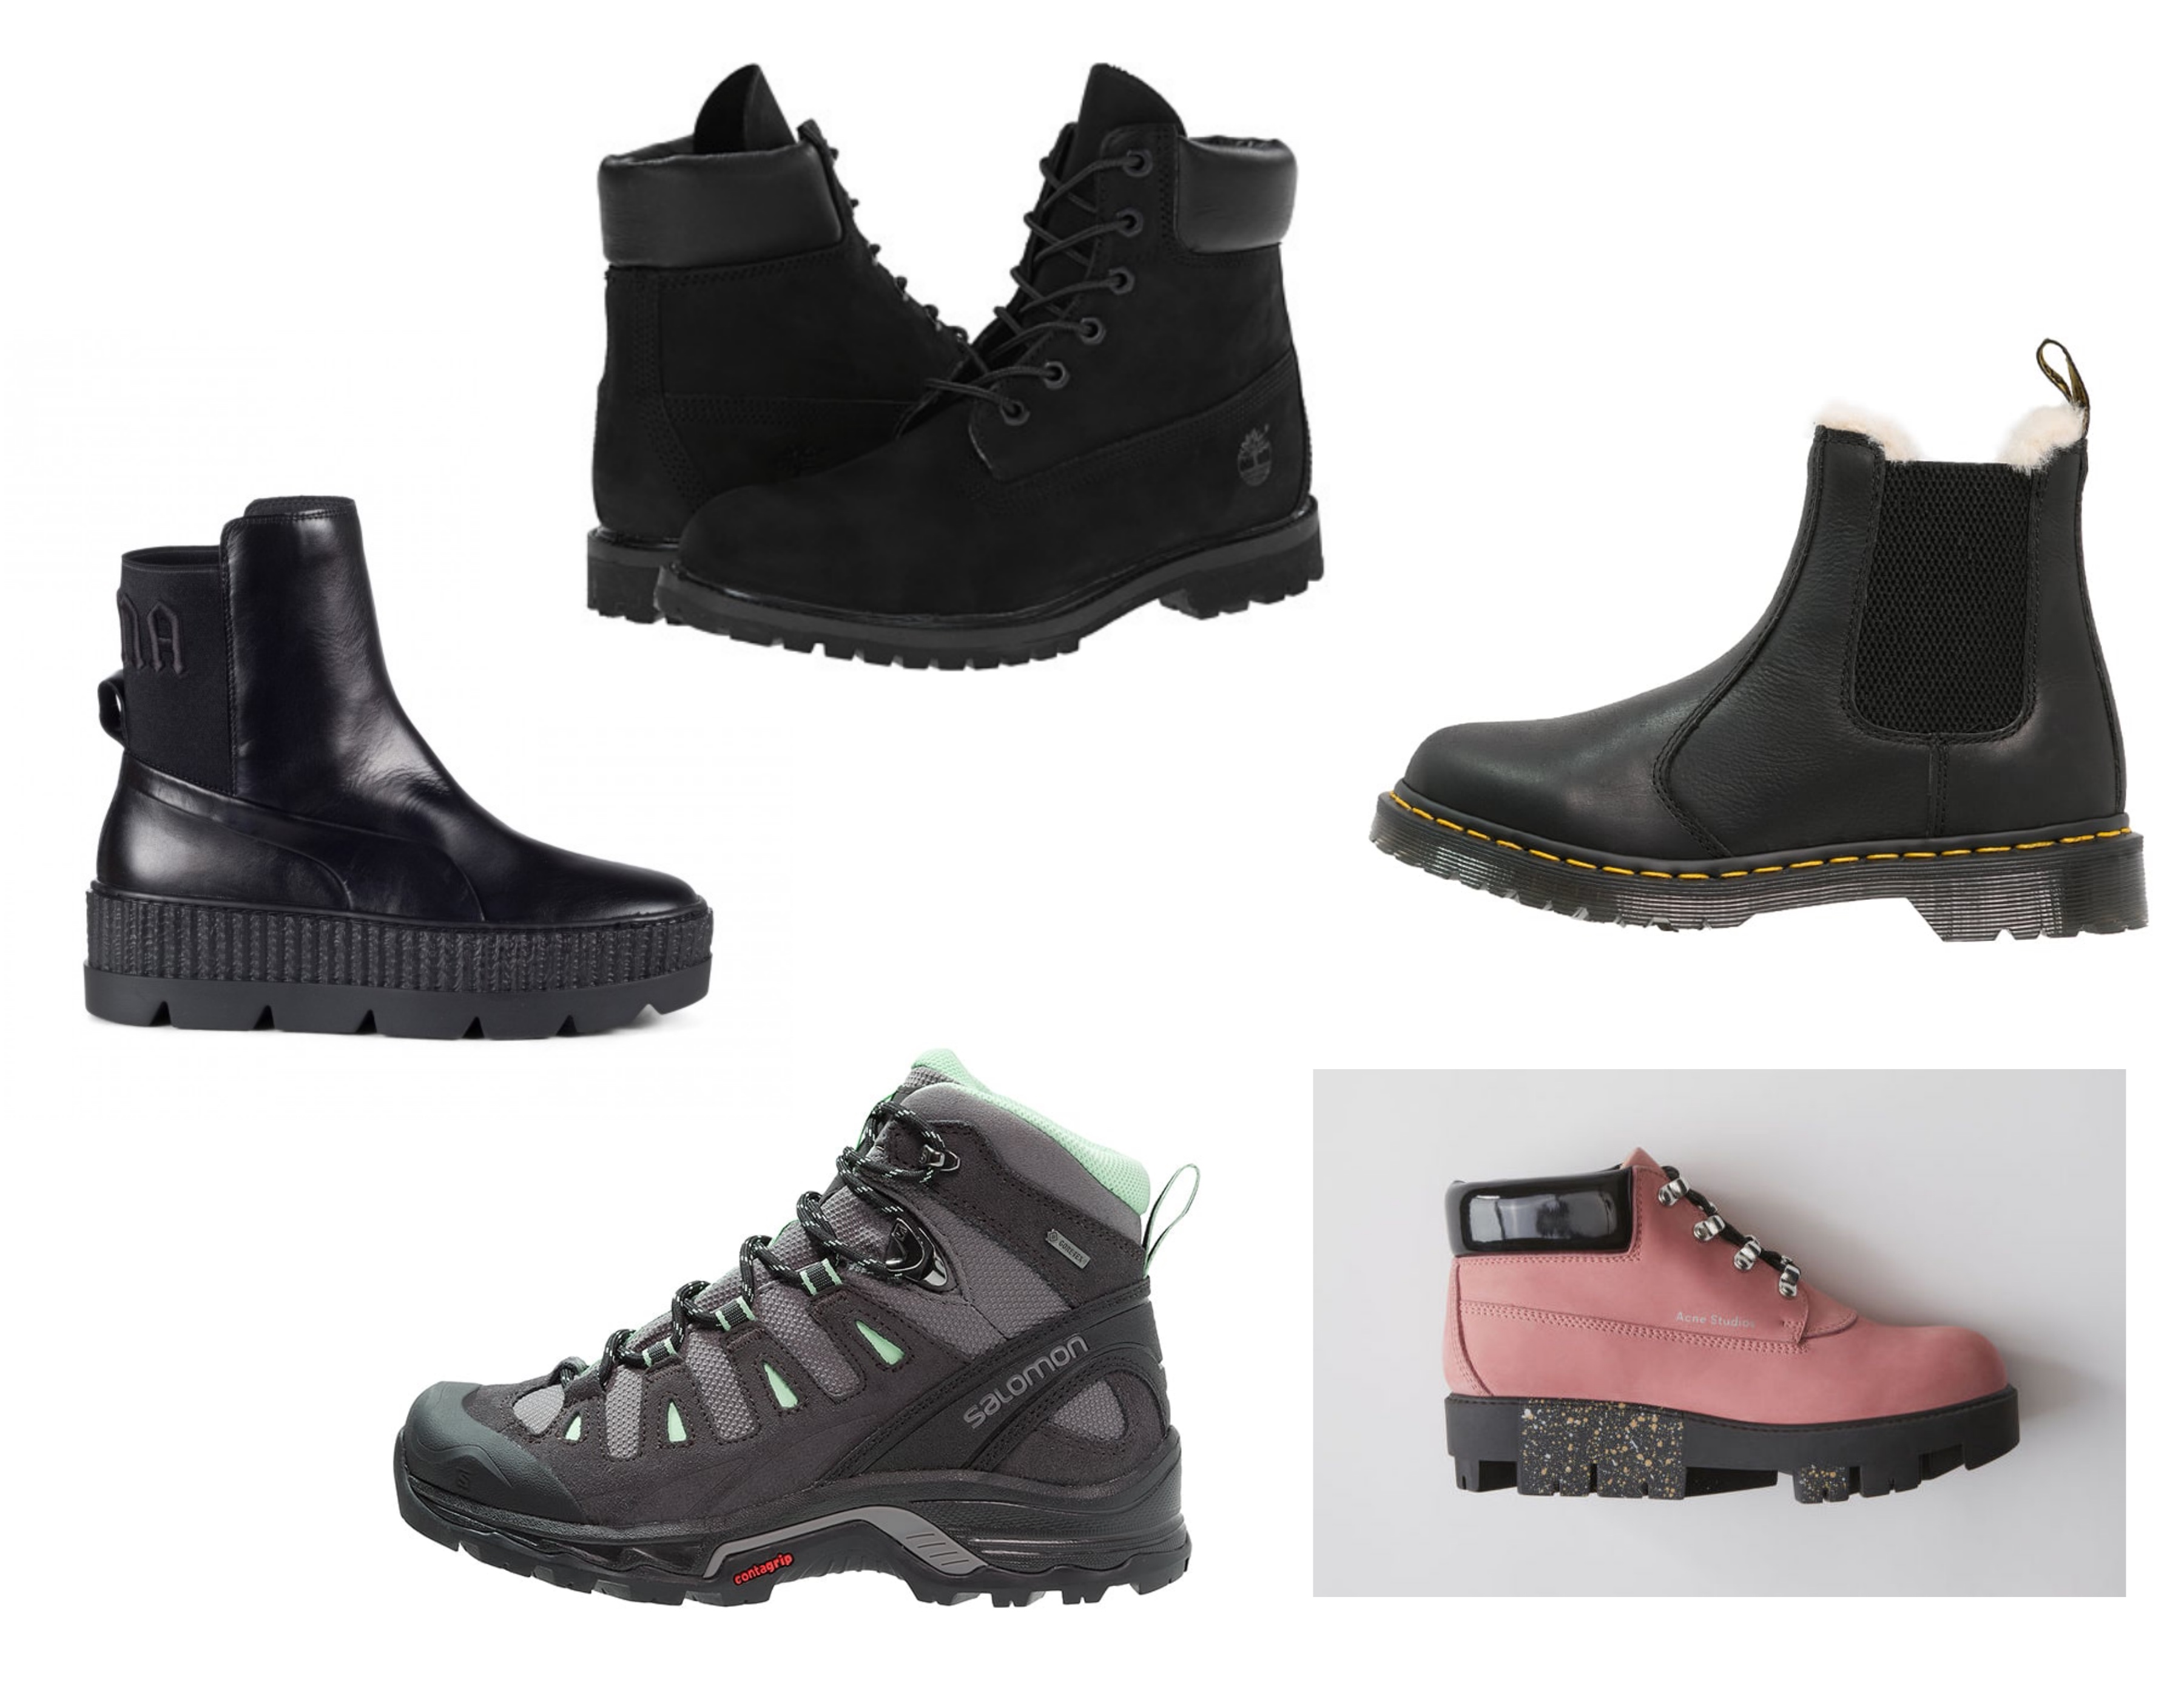 6d9c195a ... Ceremony (2251,-) Moon Boots fra via Net-a-porter (ca 1100,-) Sko med  leopard-mønster fra Diemme via Yme (3999,-) Rosa Nike Duckboots via Urban  (1799,-)